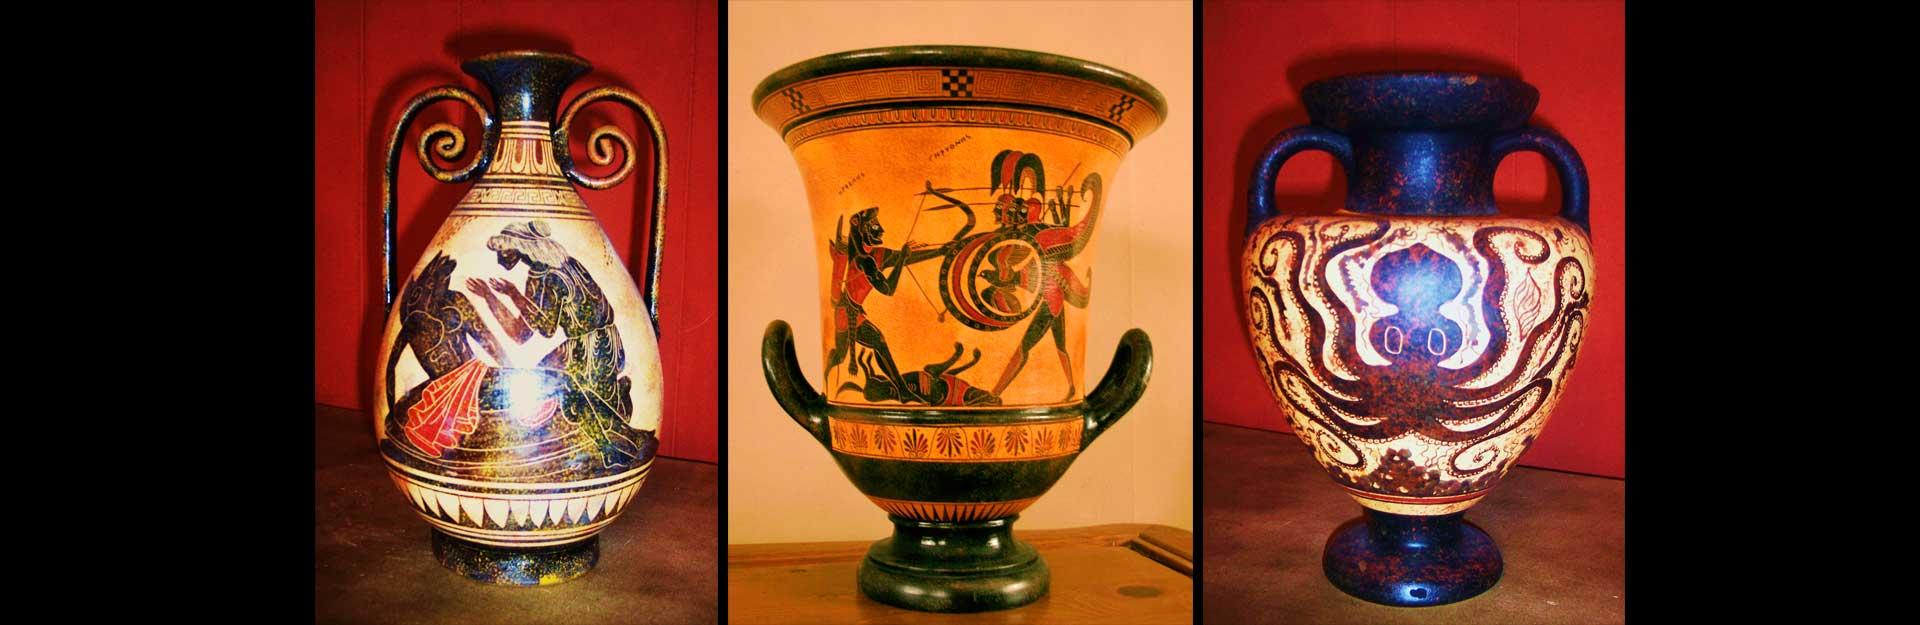 Museum of Ancient Wonders | Ancient Artifacts | Coachella